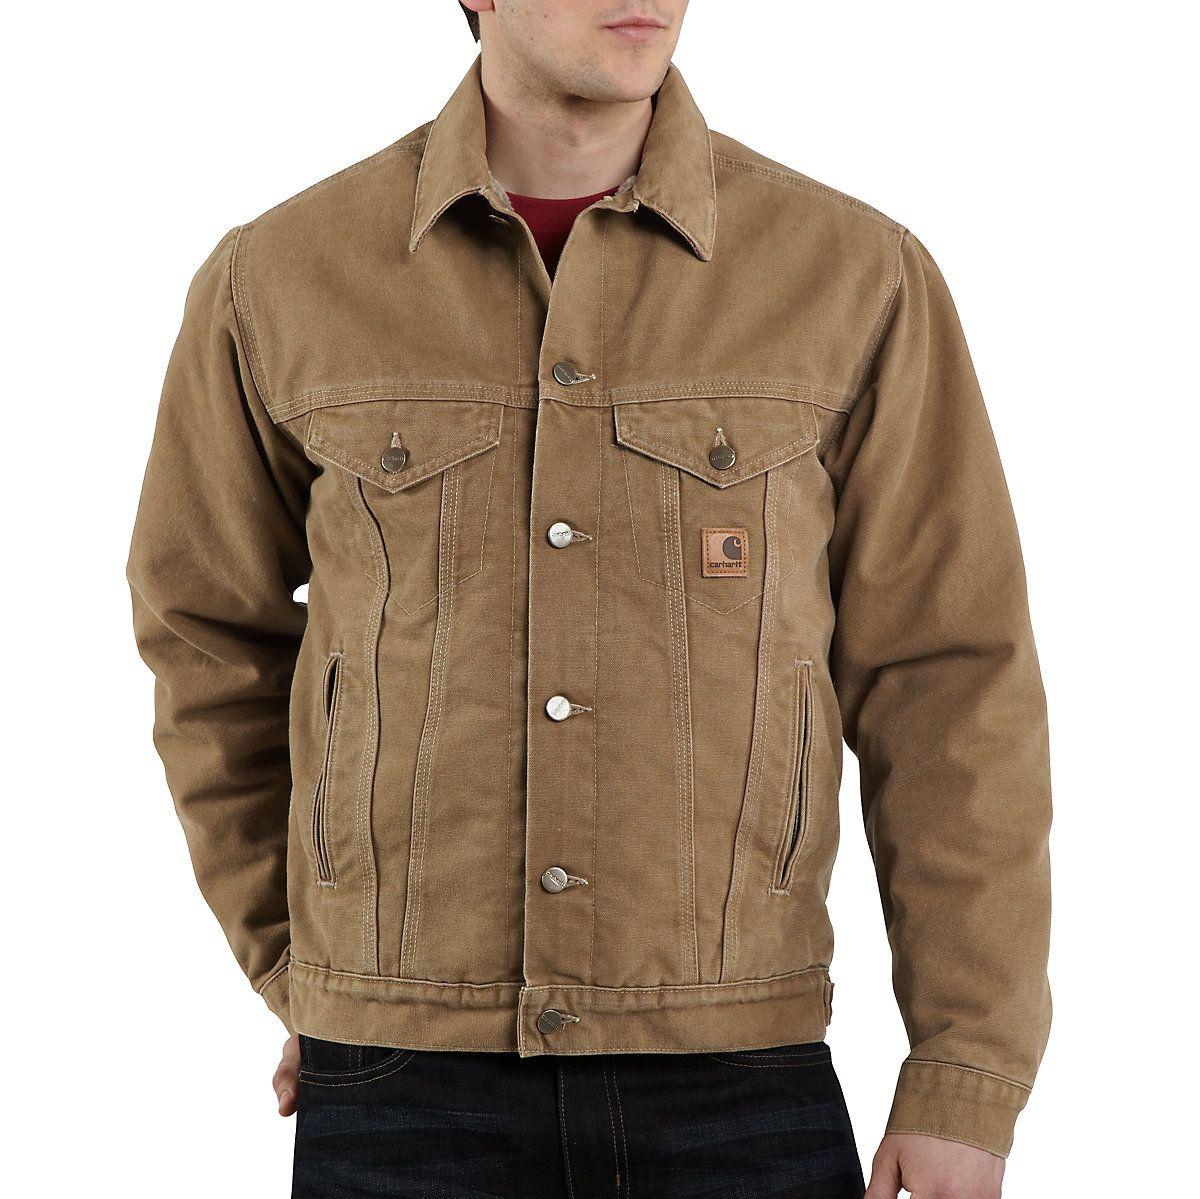 Carhartt Carhartt Jacket Jackets Carhartt Mens [ 1199 x 1200 Pixel ]